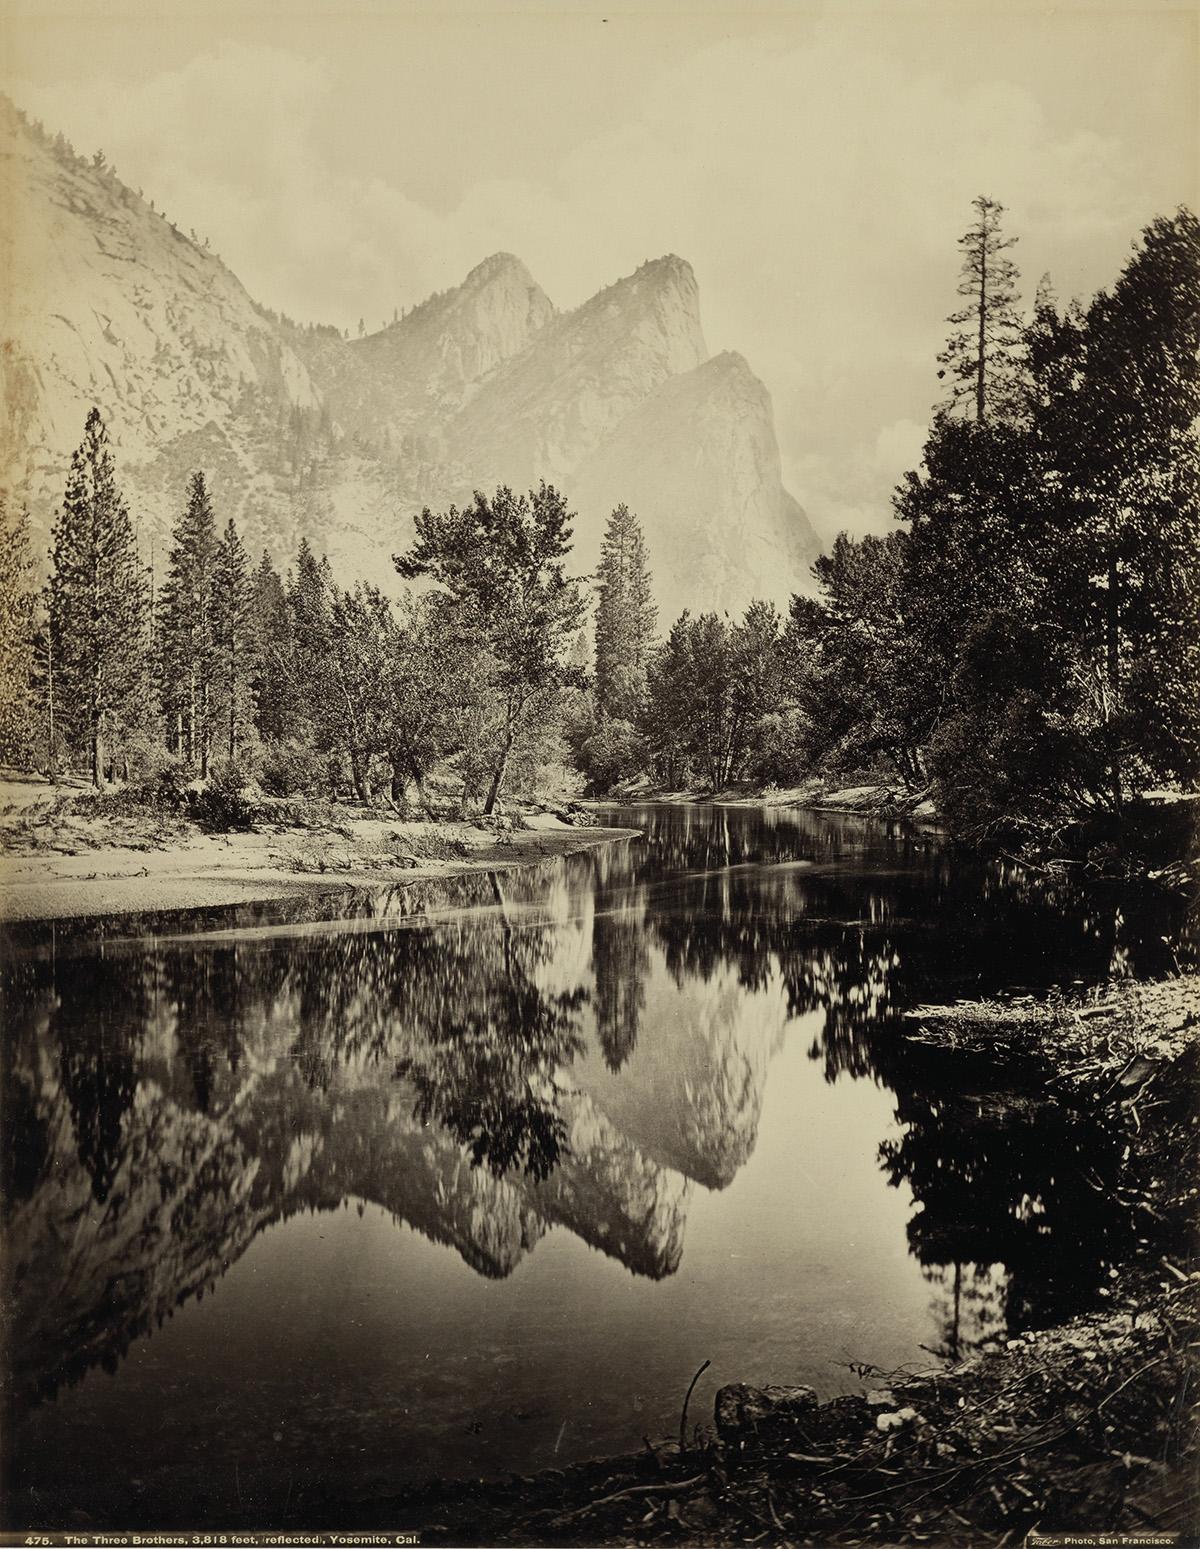 CARLETON E. WATKINS (1829-1916)/ISAIAH TABER (1830-1912) The Three Brothers, 3,818 feet, reflected, Yosemite, California.